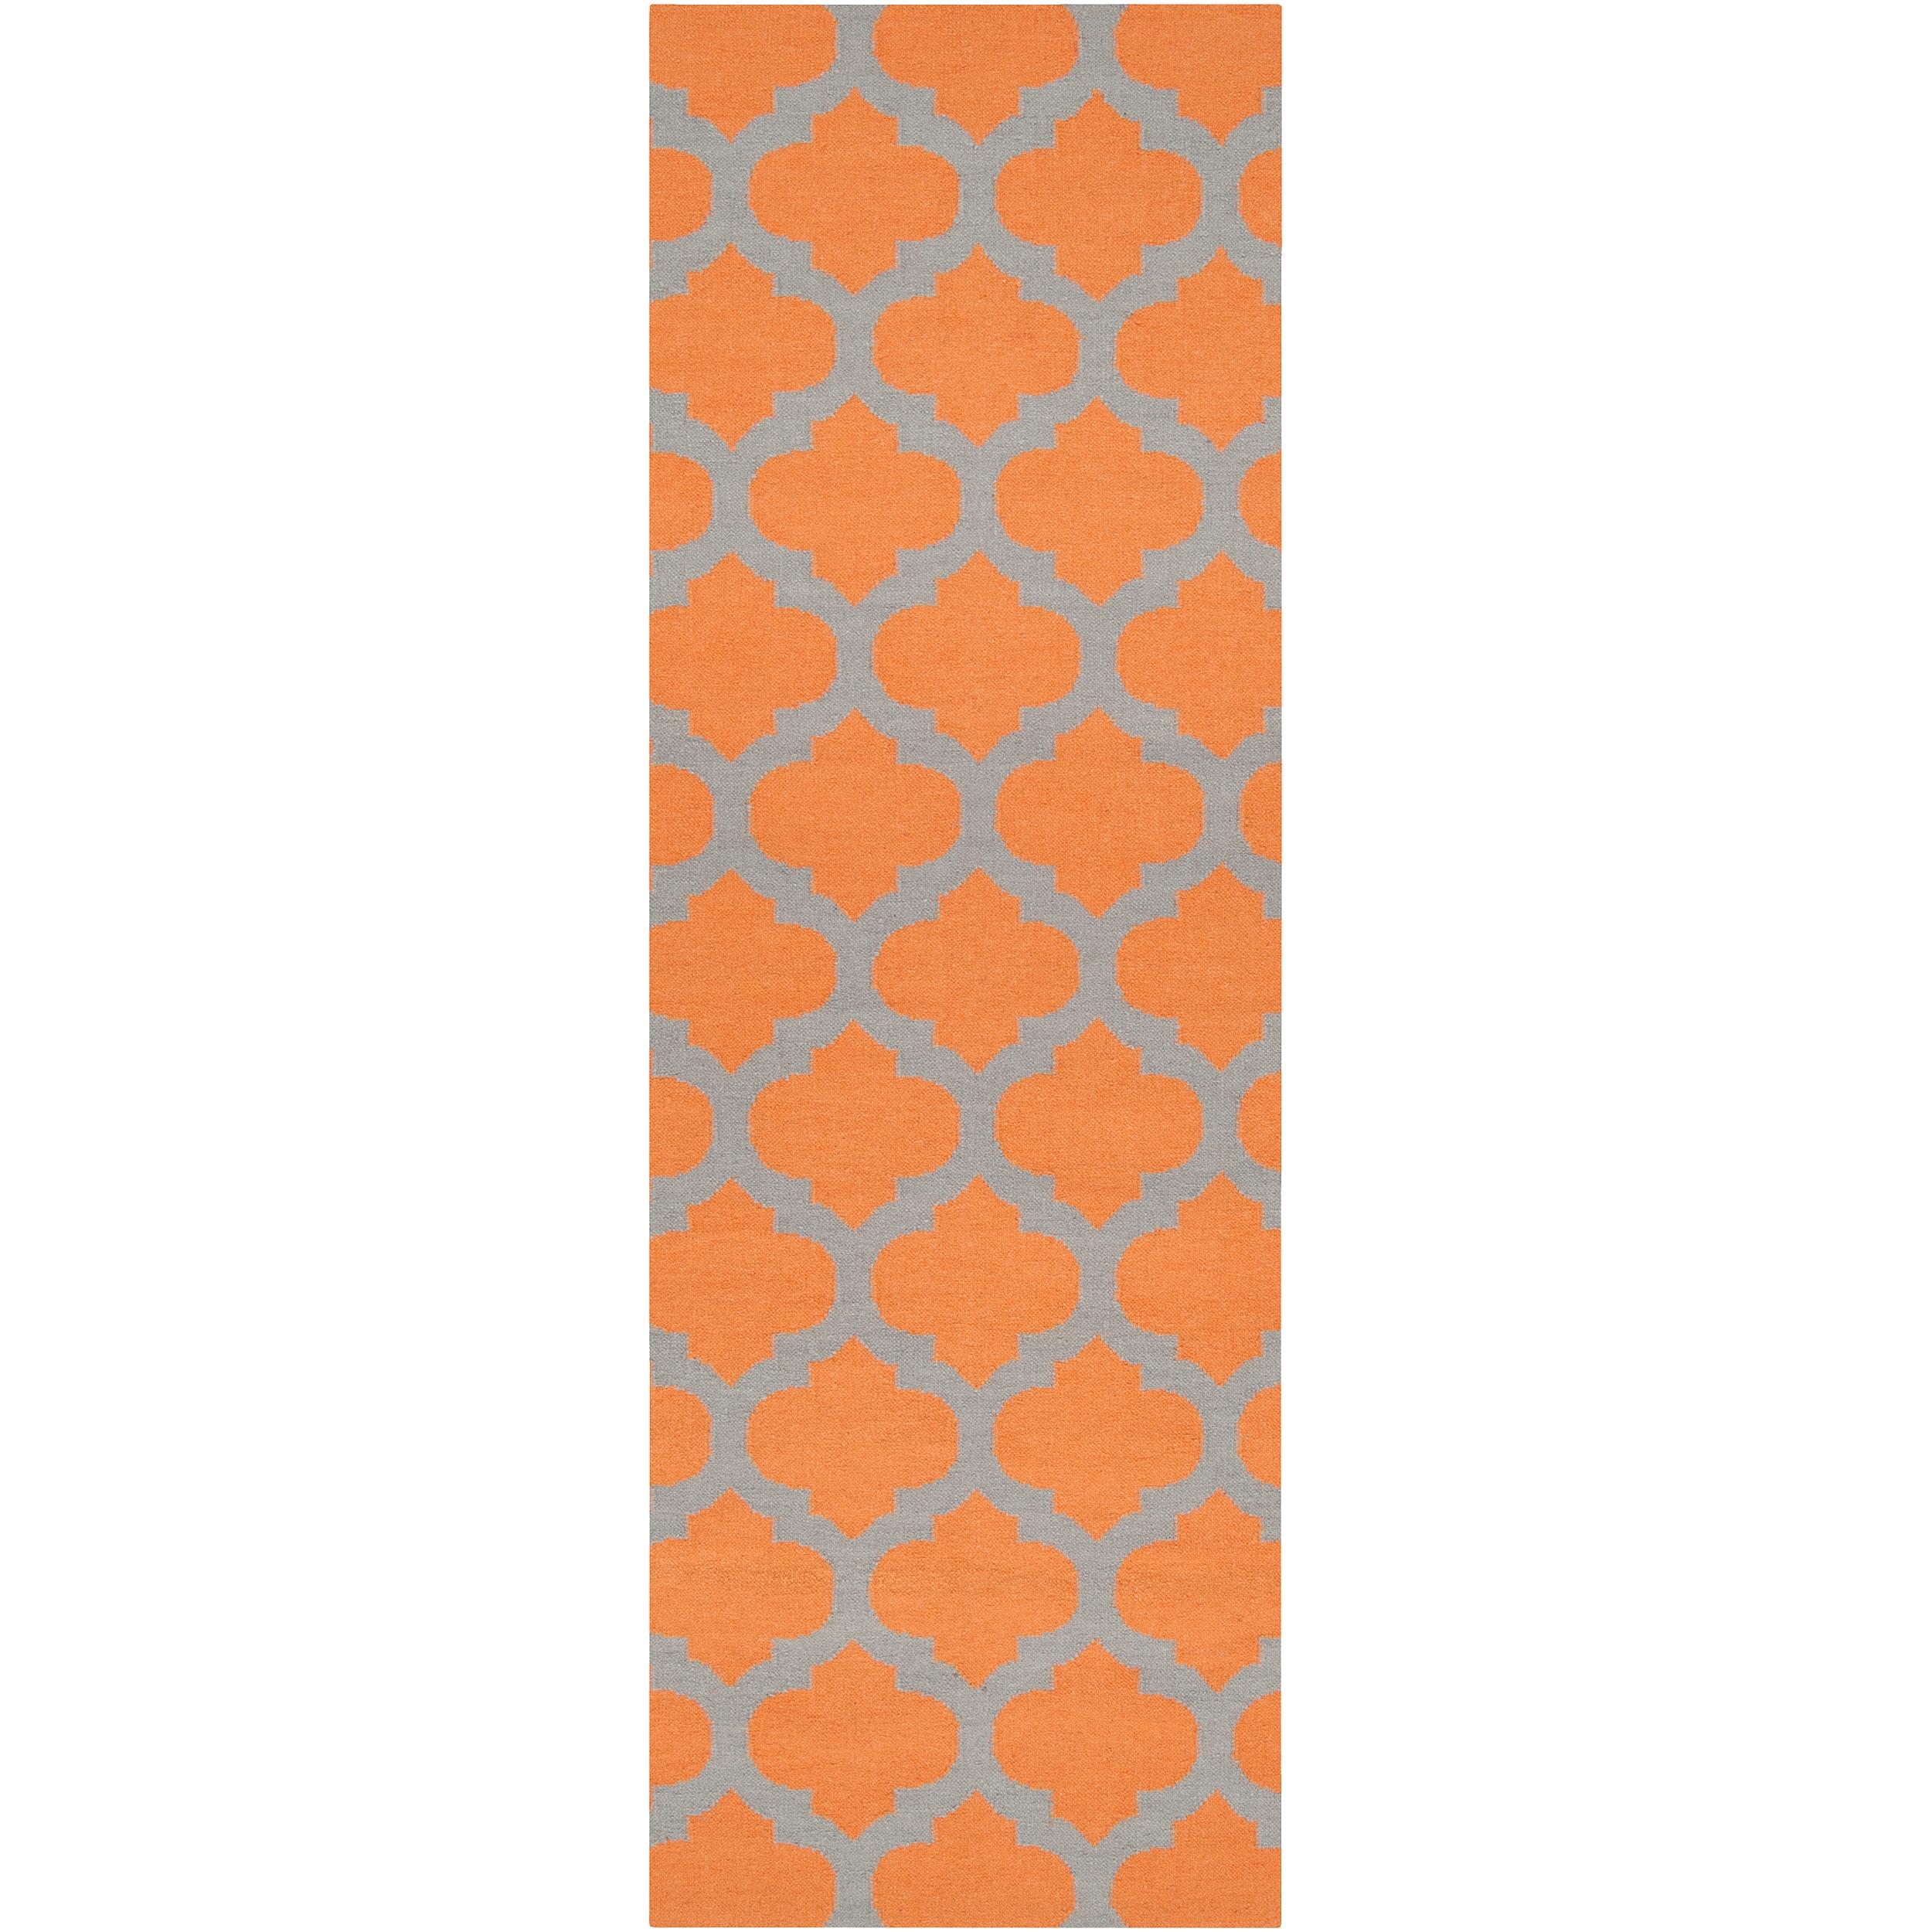 Hand-woven Orange Caroni Wool Rug (2'6 x 8'), Size 2' x 8'